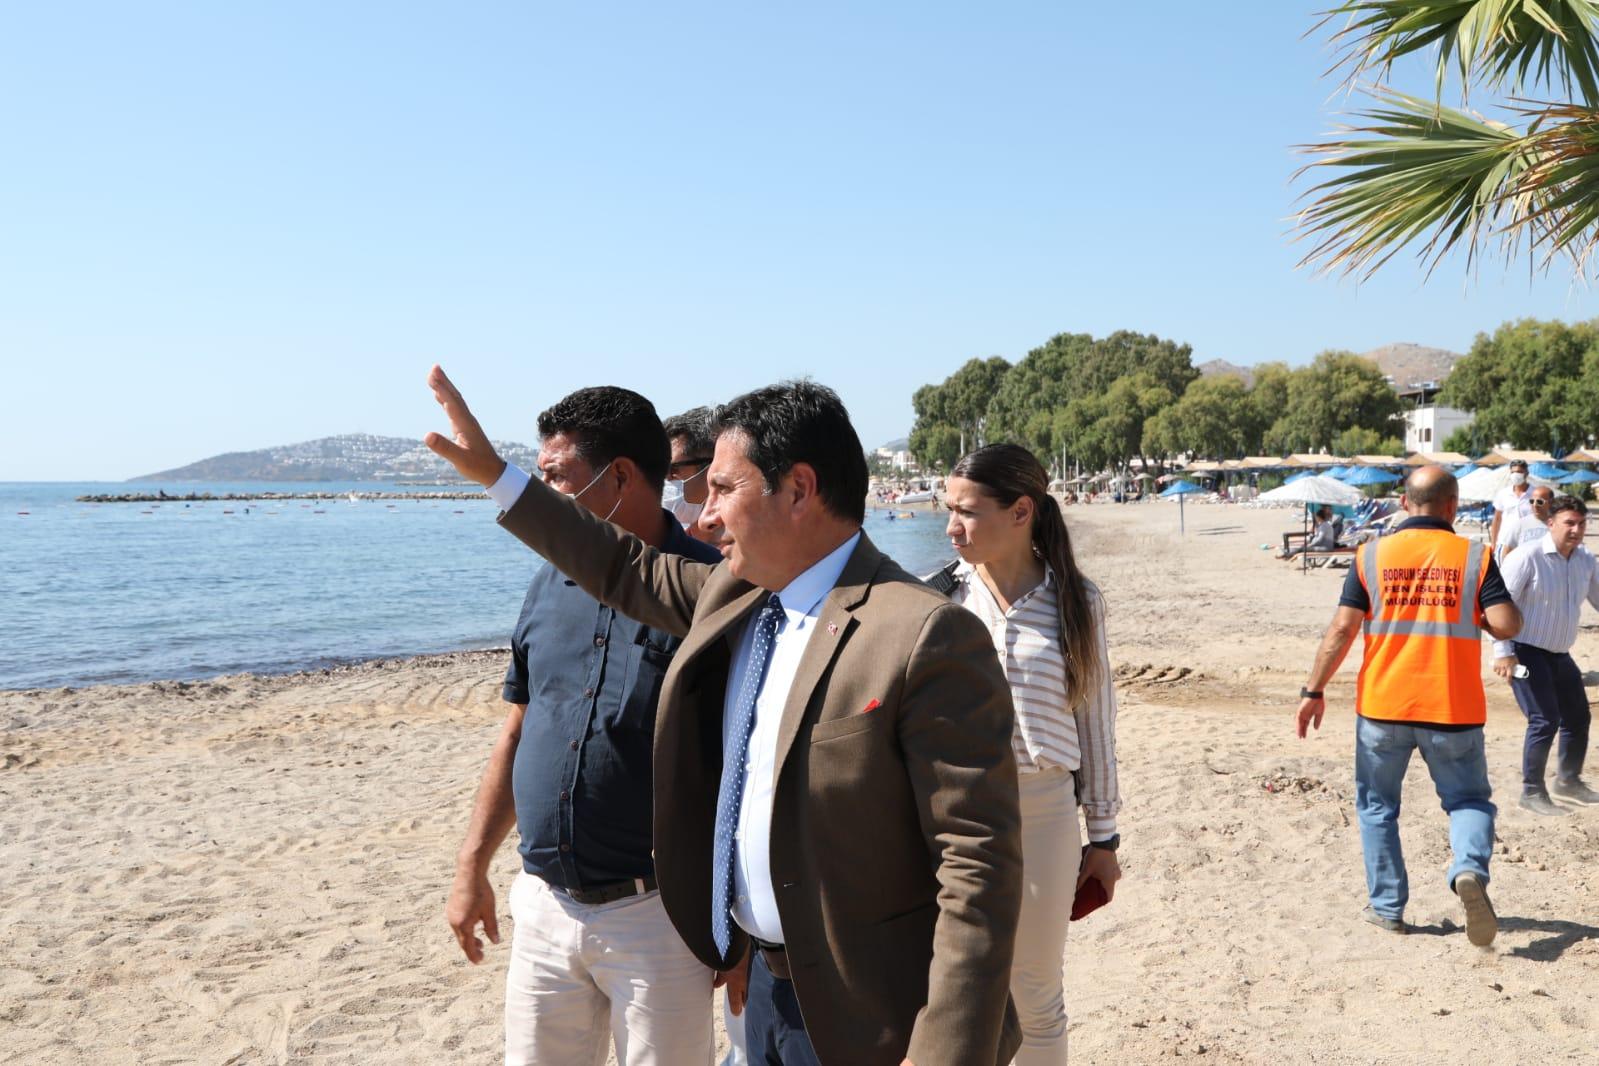 BAŞKAN ARAS TURGUTREİS'TE İNCELEMELERDE BULUNDU